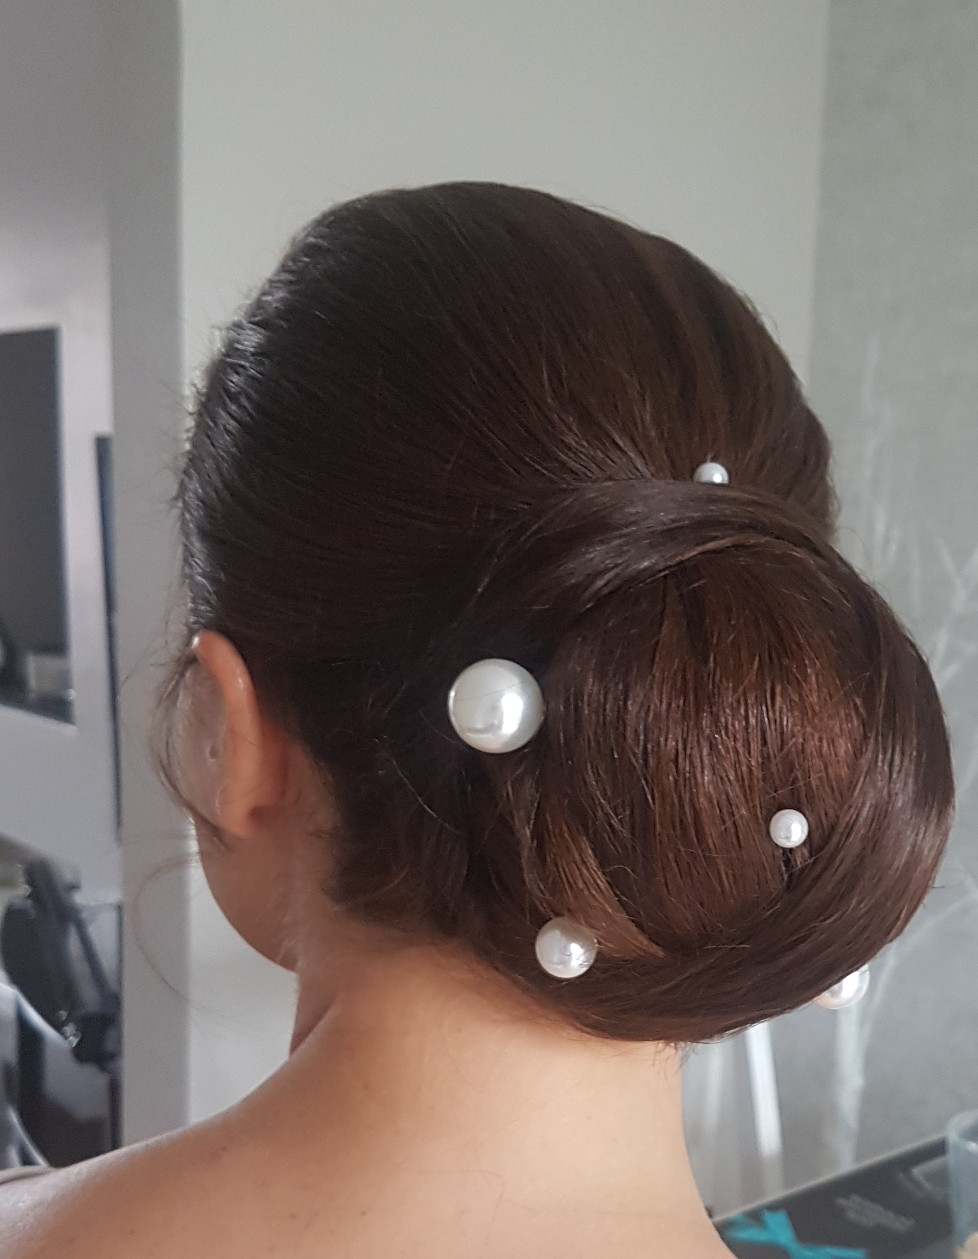 - Make Me Bridal Artist: Hair Creations North West. #classic #bridalhair #hairup #bun #bridalhairstylist #sleek #sleekhair #smoothupdo #detailedupdo #pearl